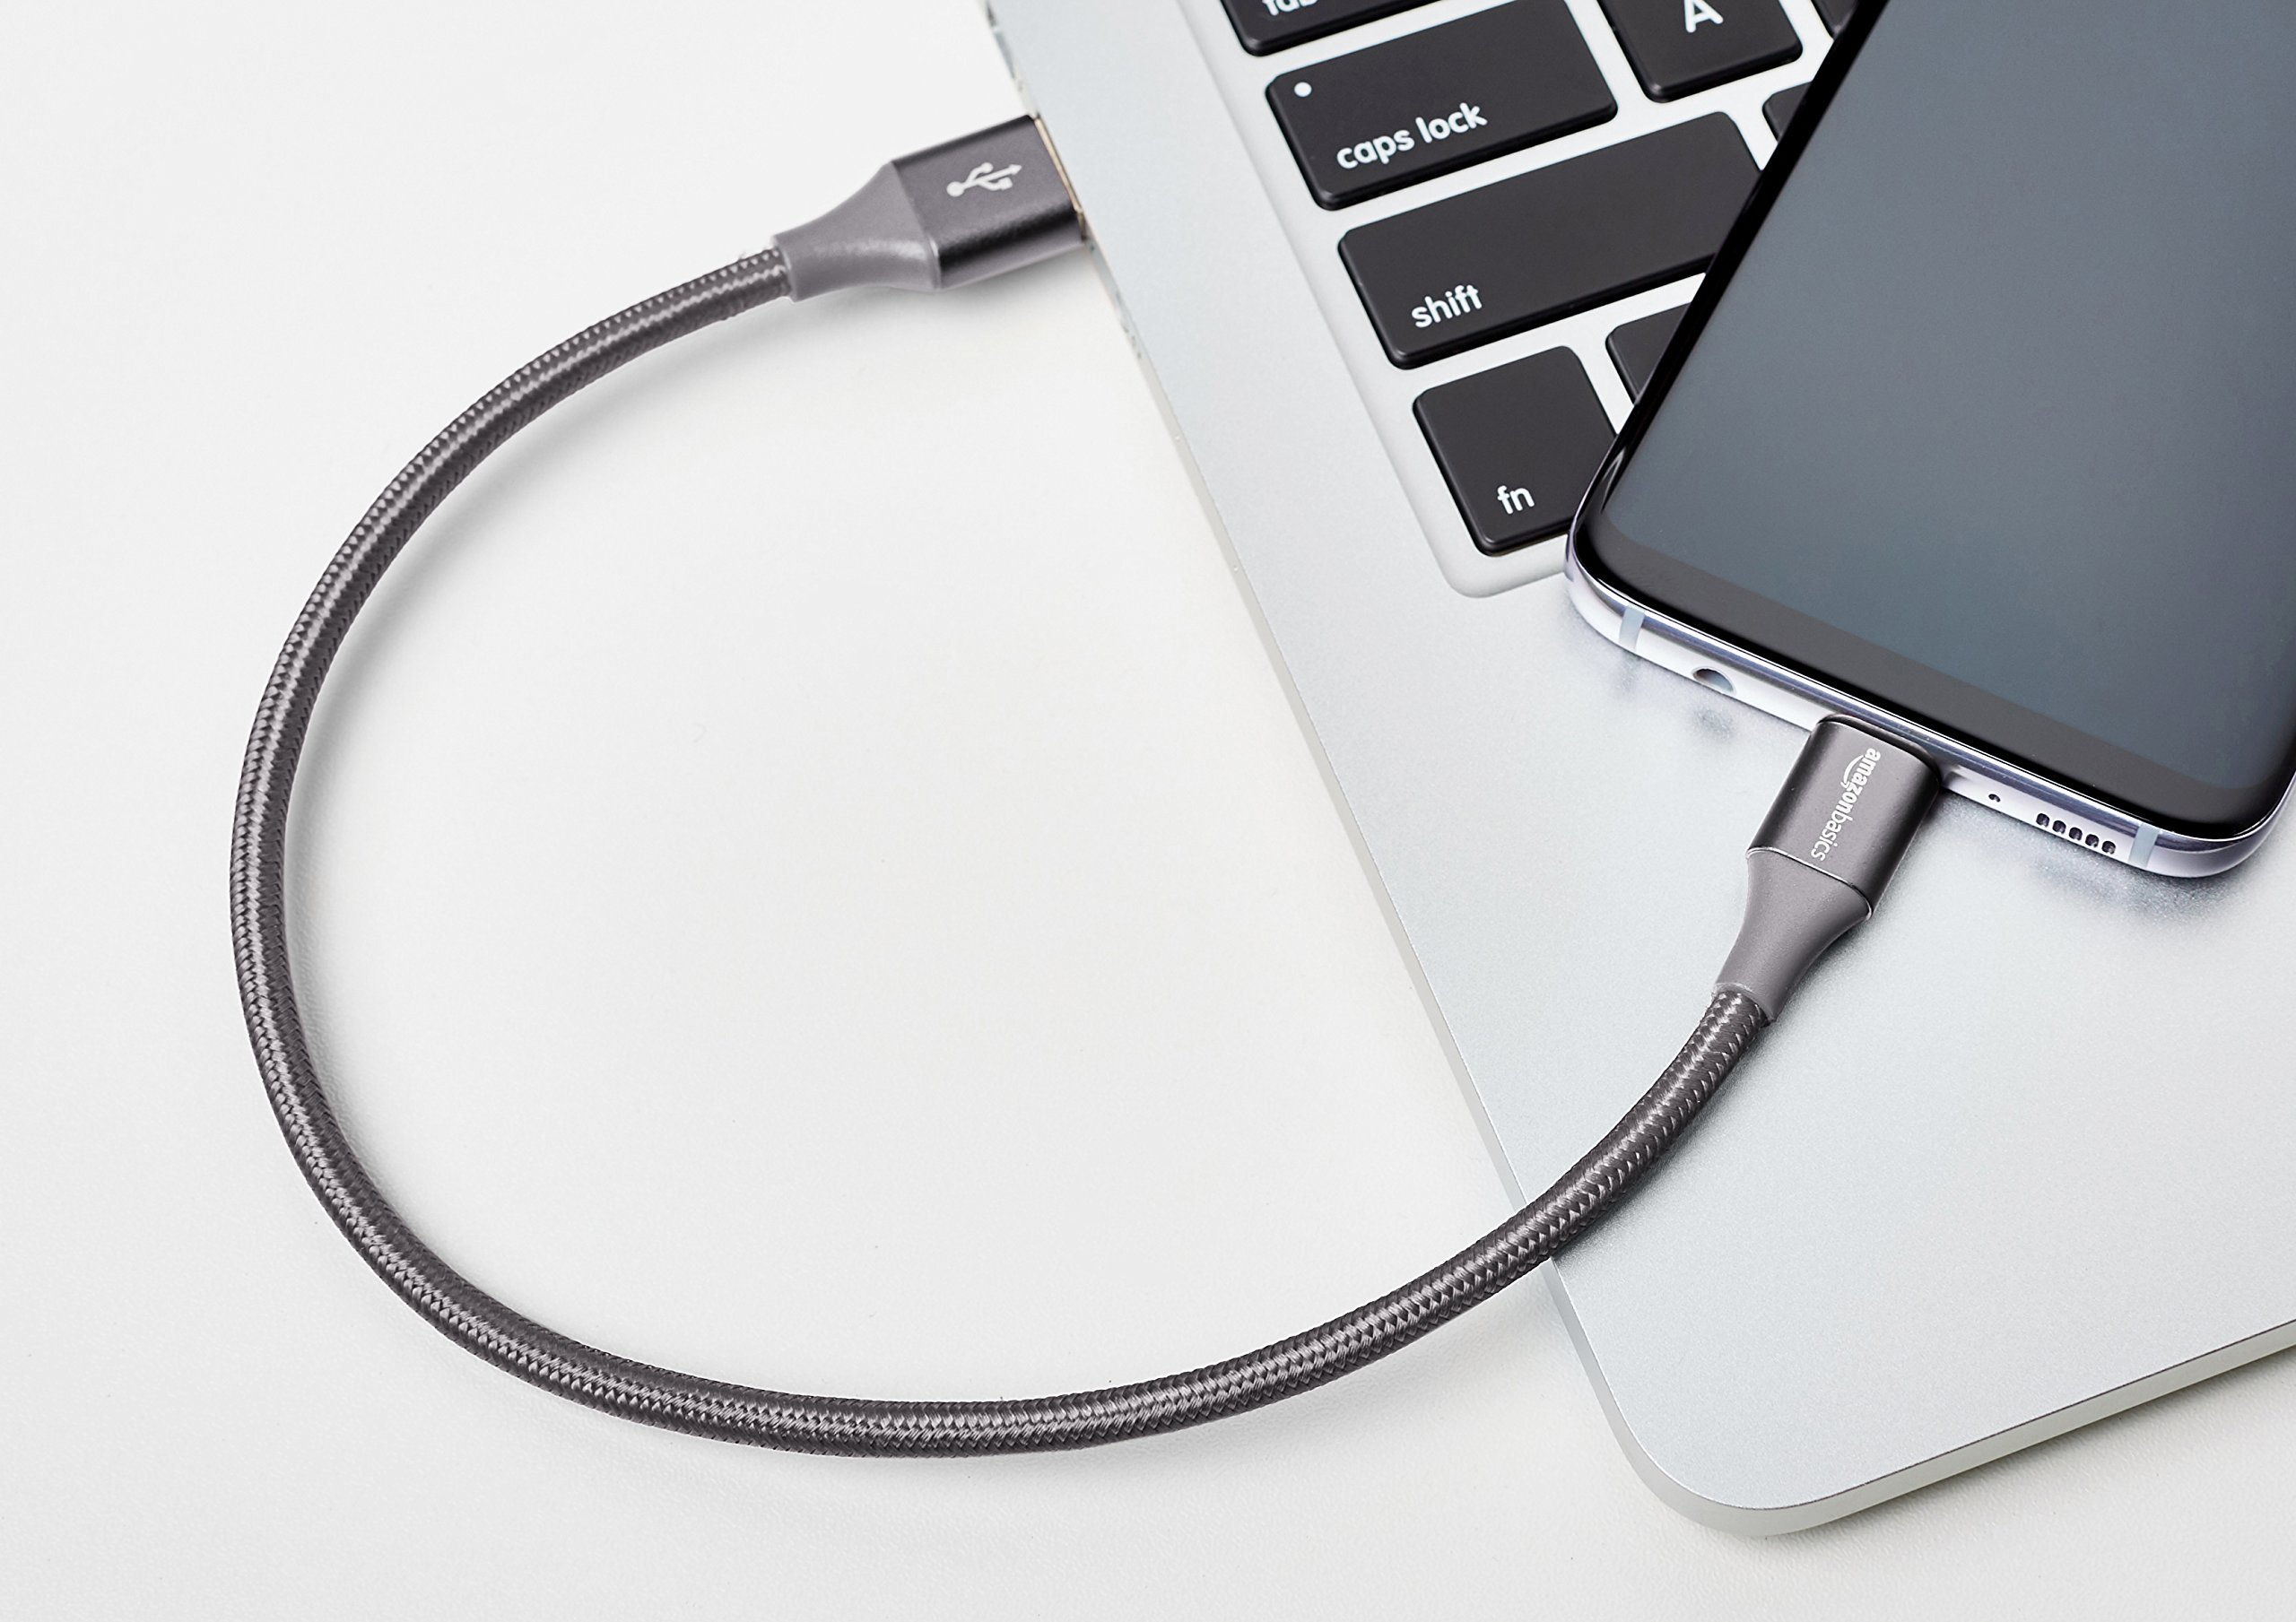 AmazonBasics Double Braided Nylon USB Type-C to Type-A 3.1 Gen 2 Cable   1 feet, Dark Grey by AmazonBasics (Image #2)